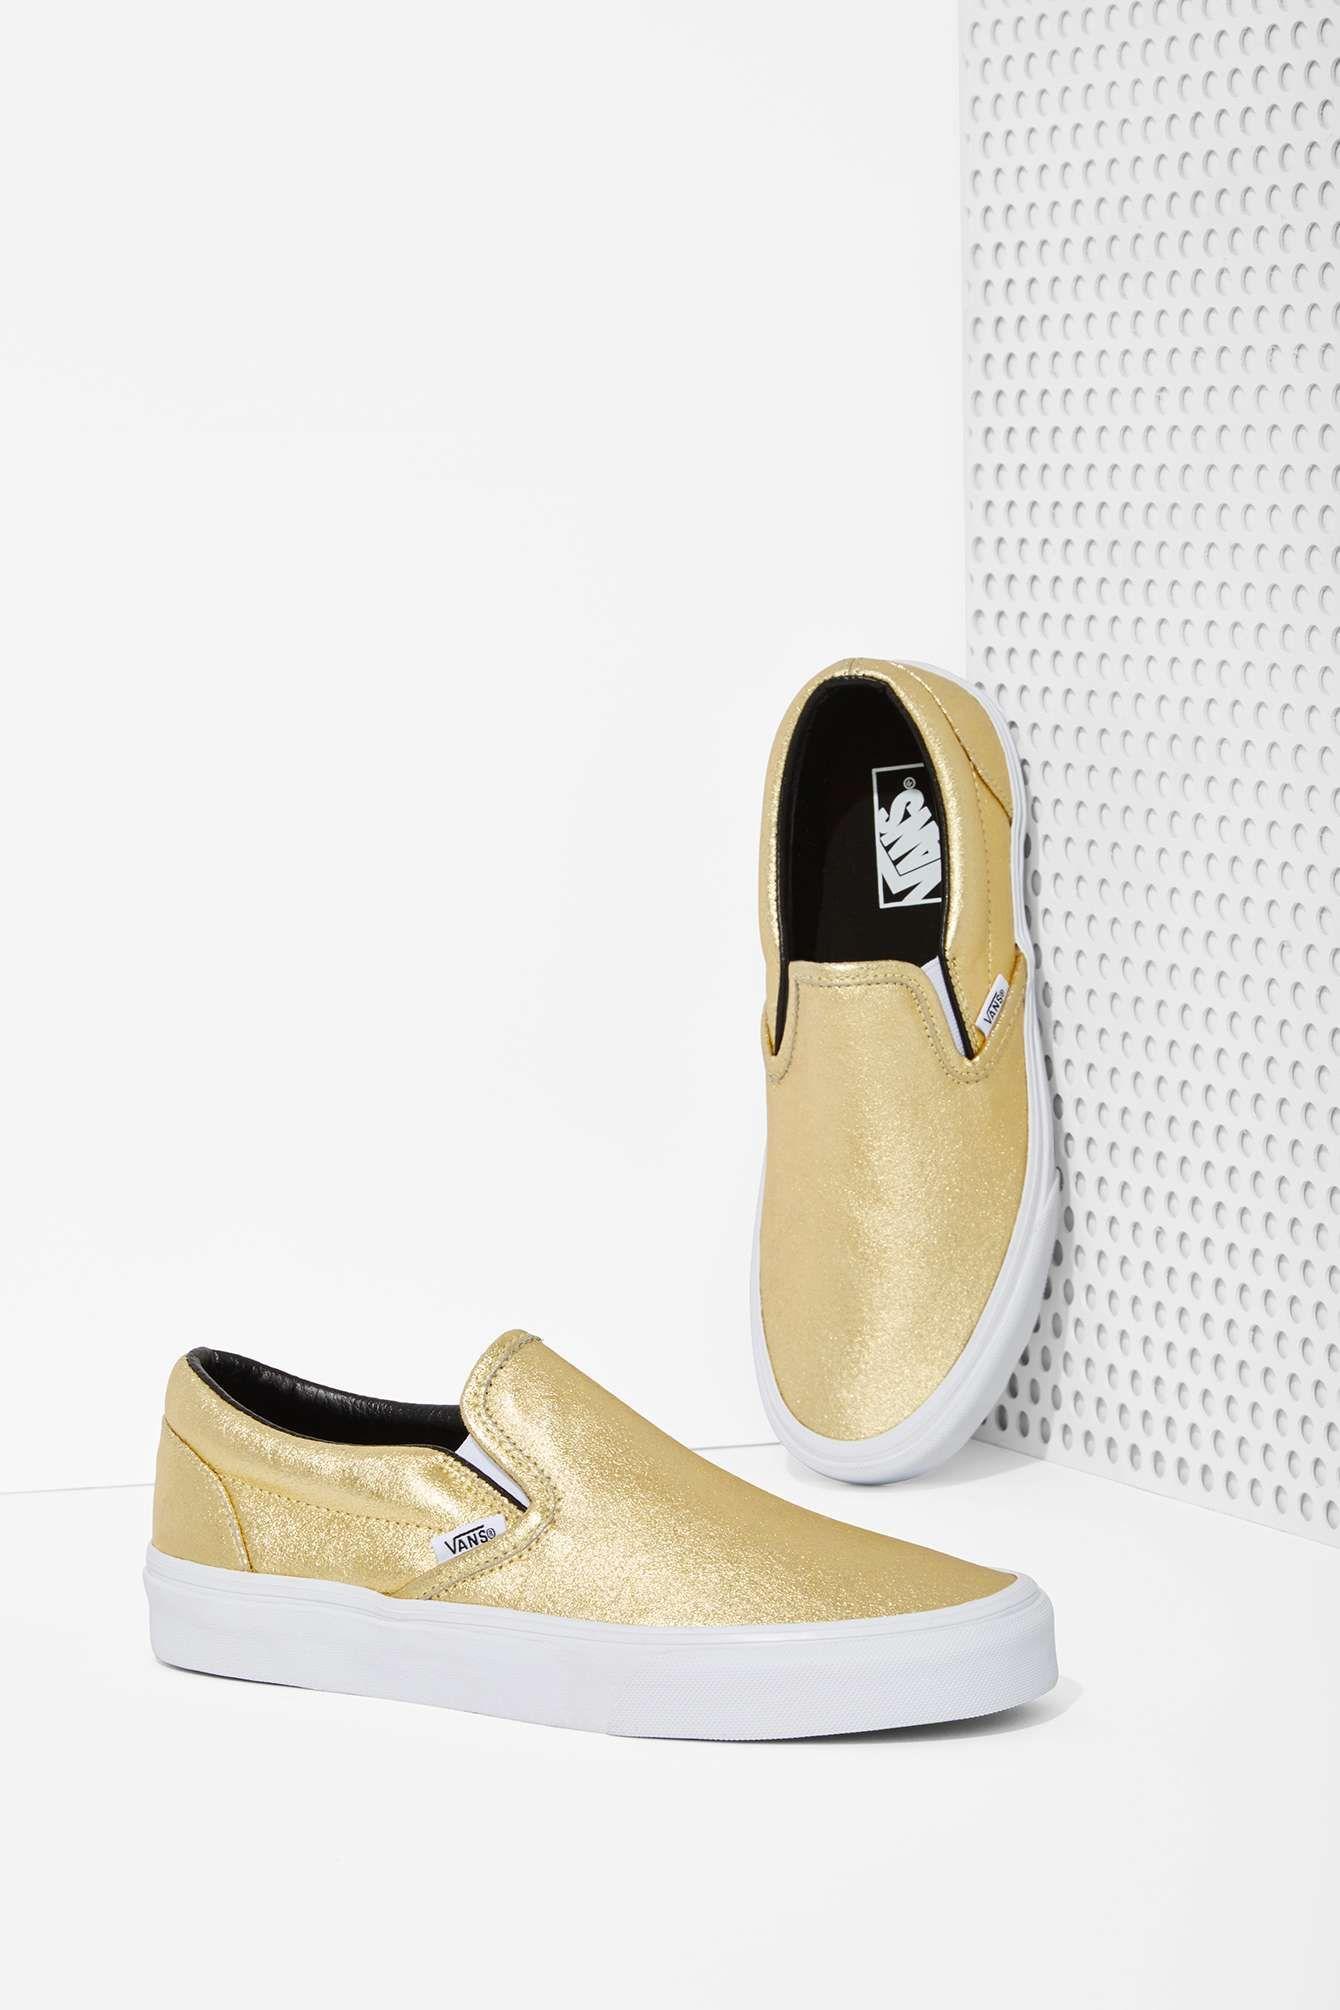 Vans Classic Slip On Sneaker Metallic Gold | (With images